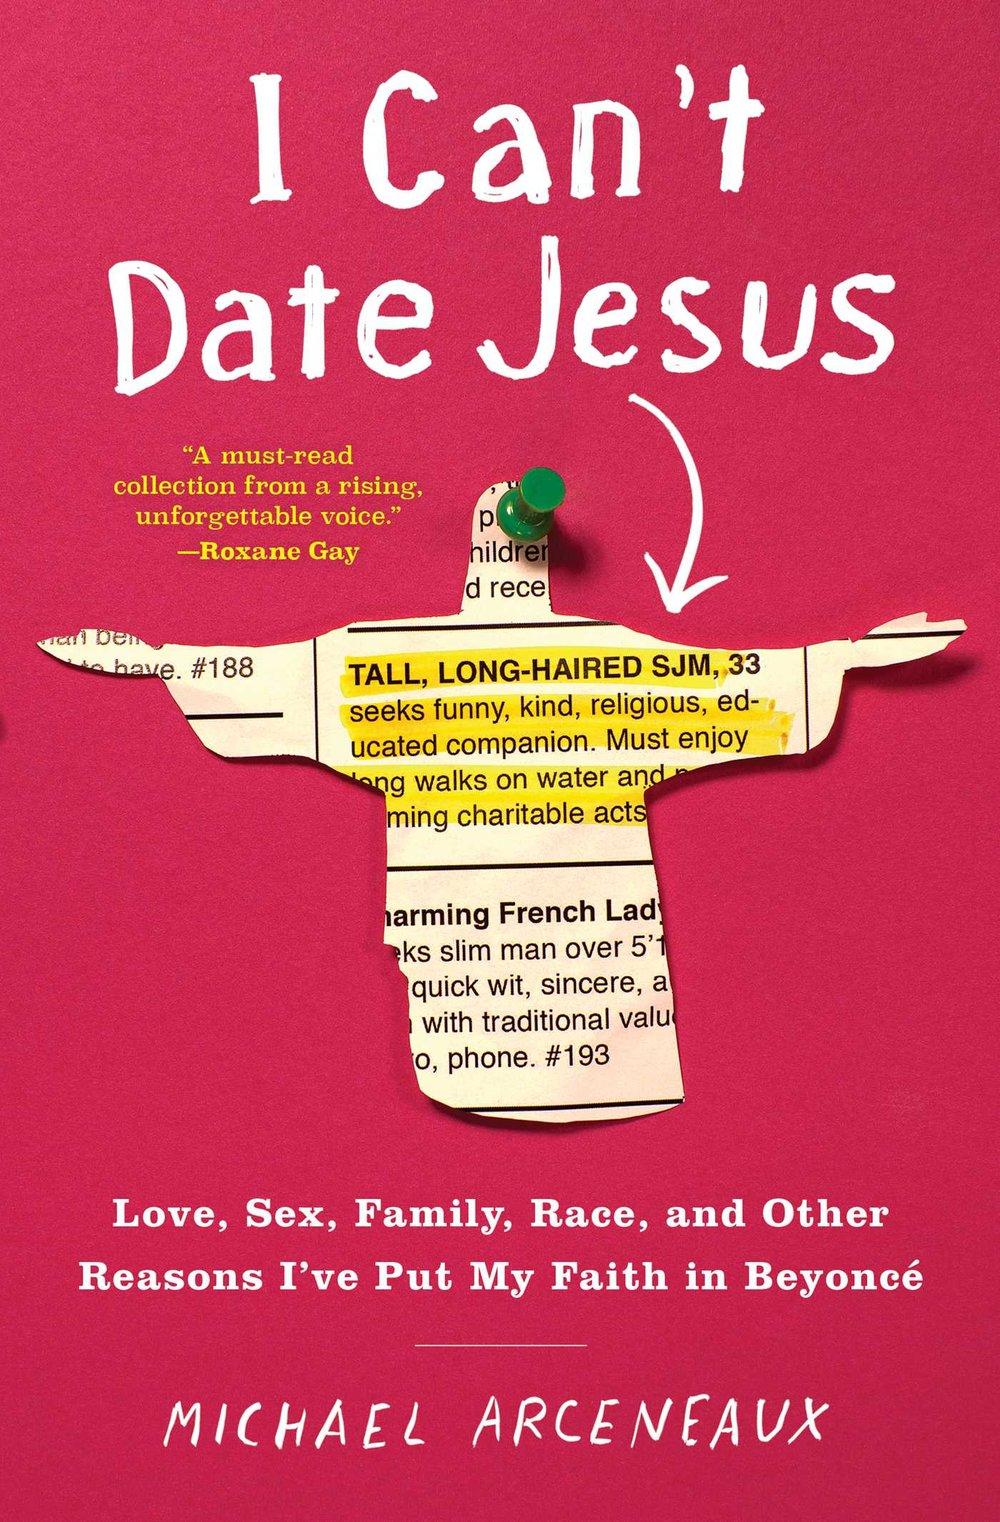 i can't date jesus.jpg